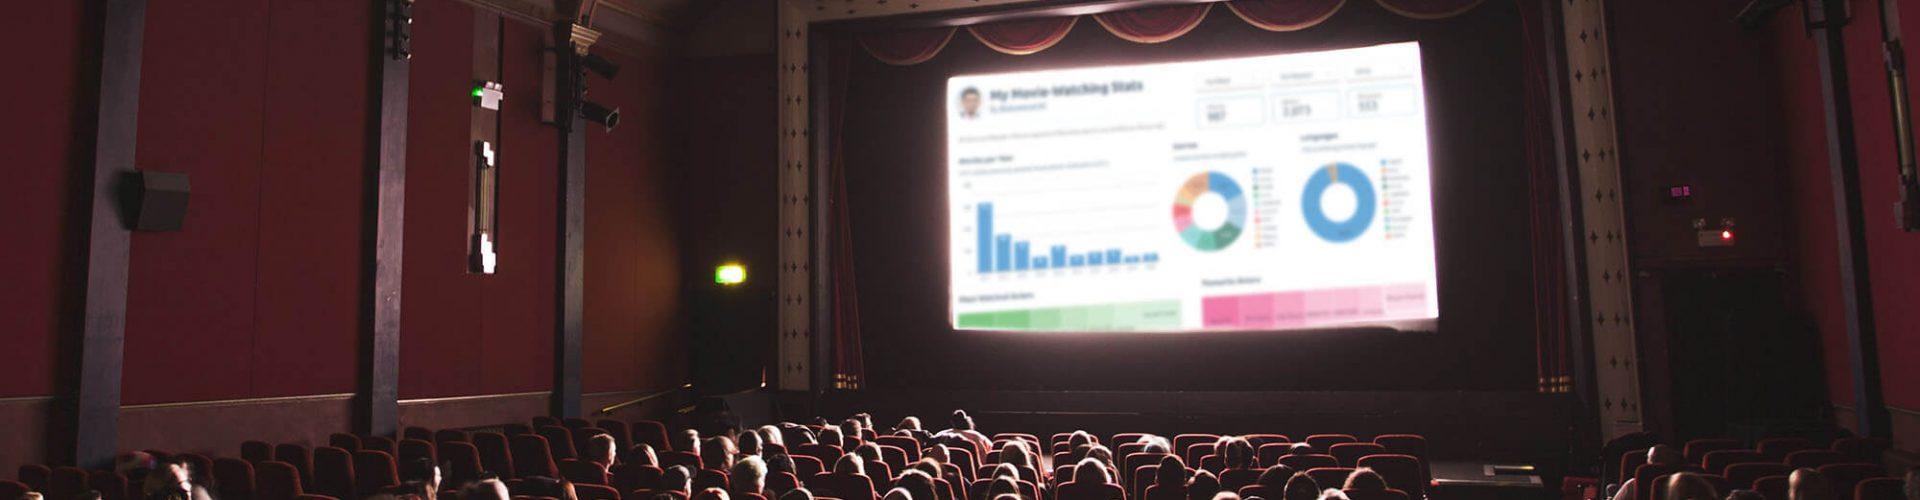 Movie Stats Visualized by Muhammad Ali